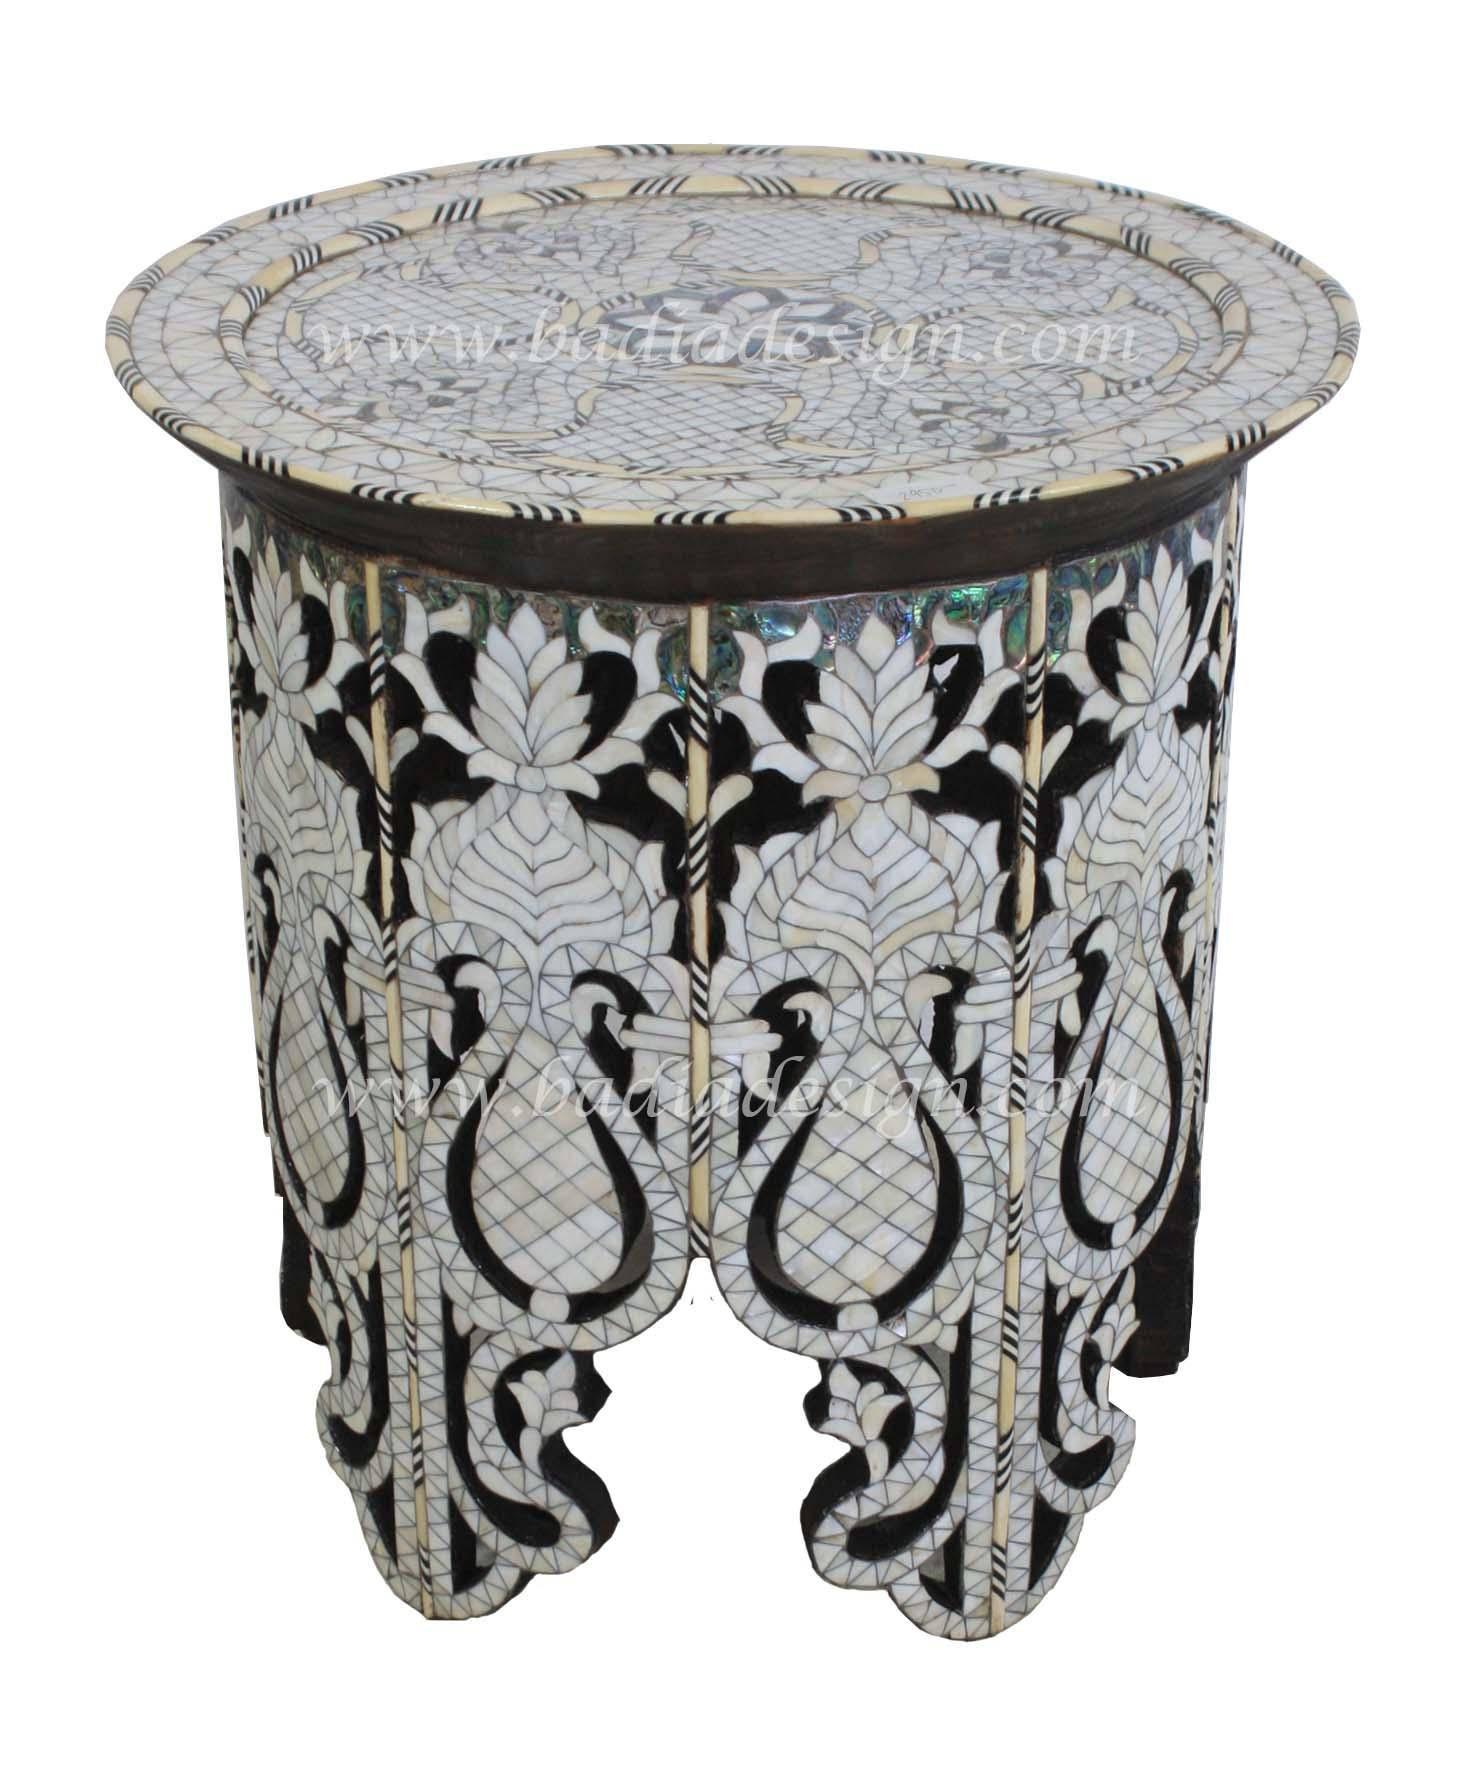 moroccan-wedding-furniture-mop-st059-1.jpg